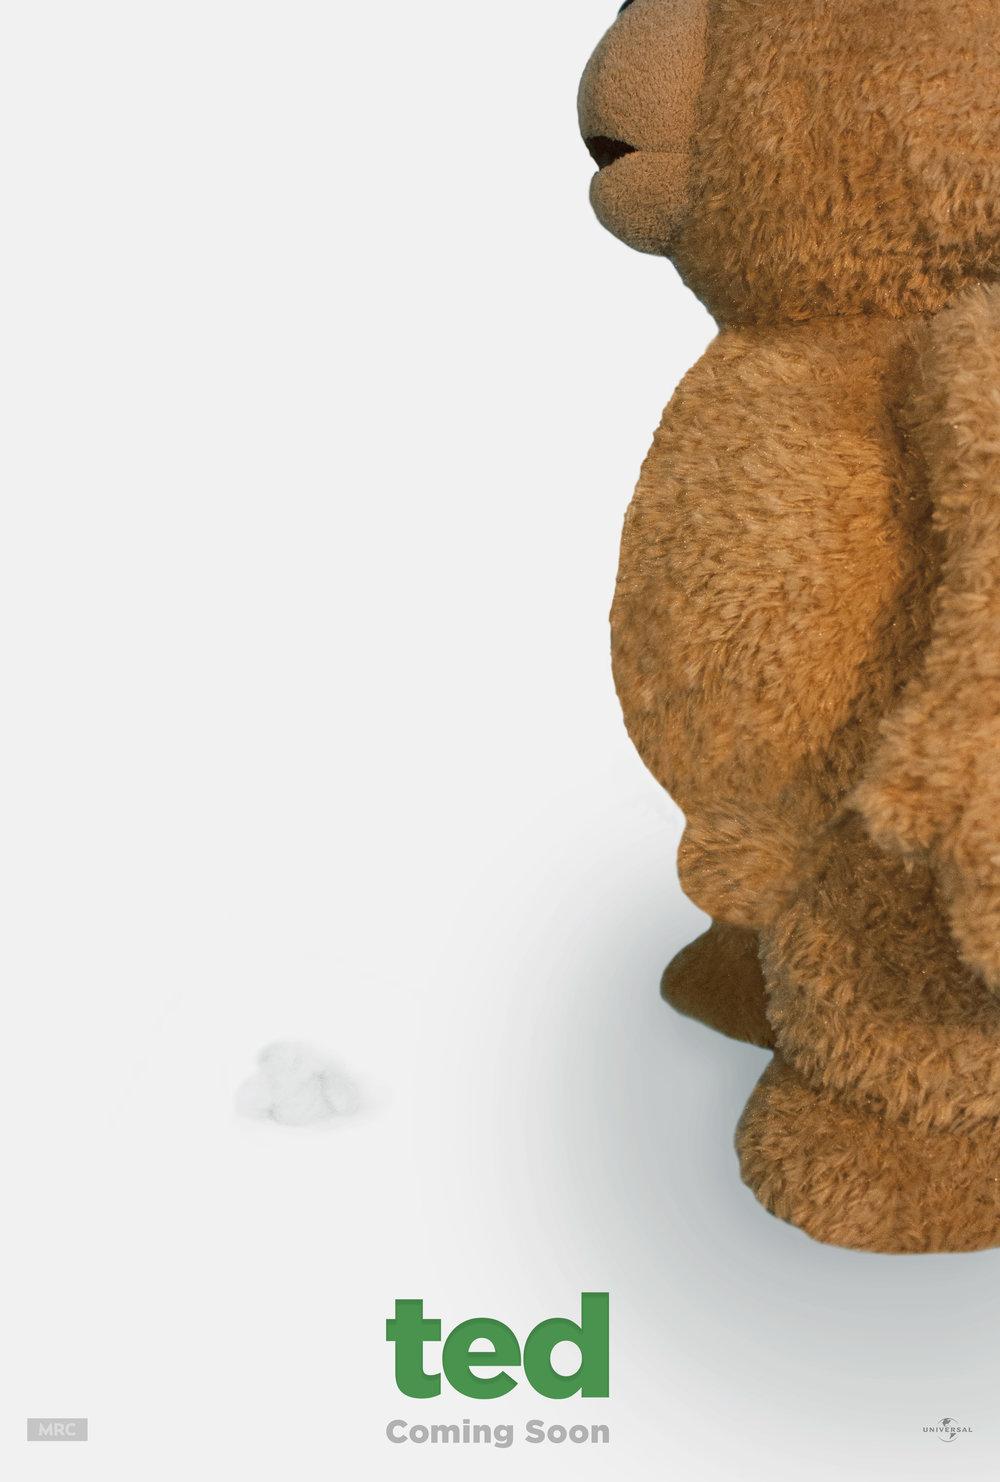 Ted-Profile-4.3-Credits.jpg